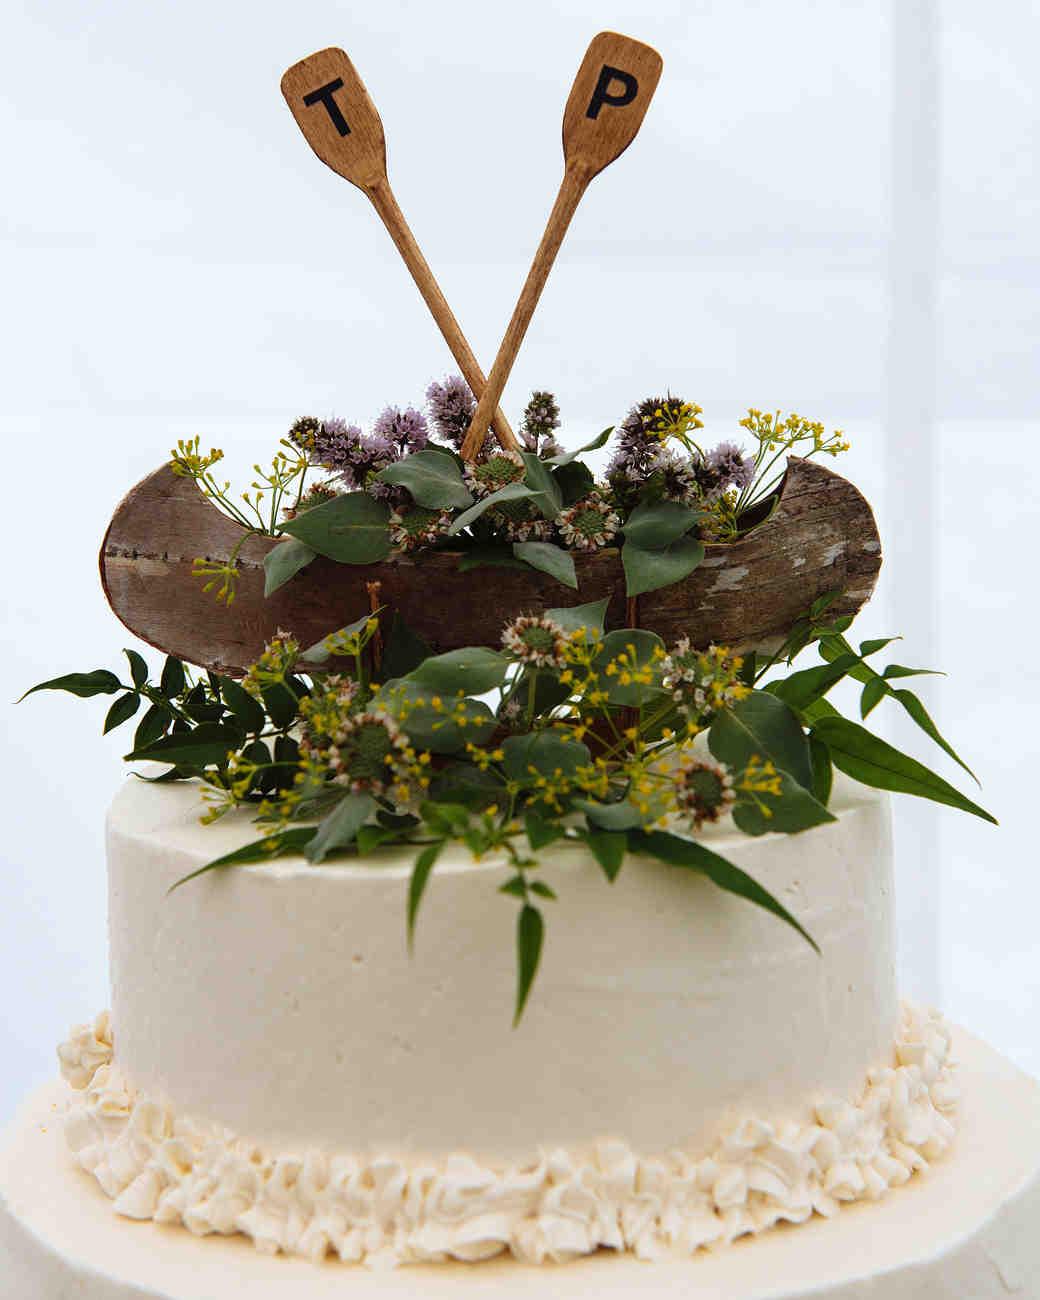 teresa-pepin-wedding-cake-topper-582-wds111105-0514.jpg